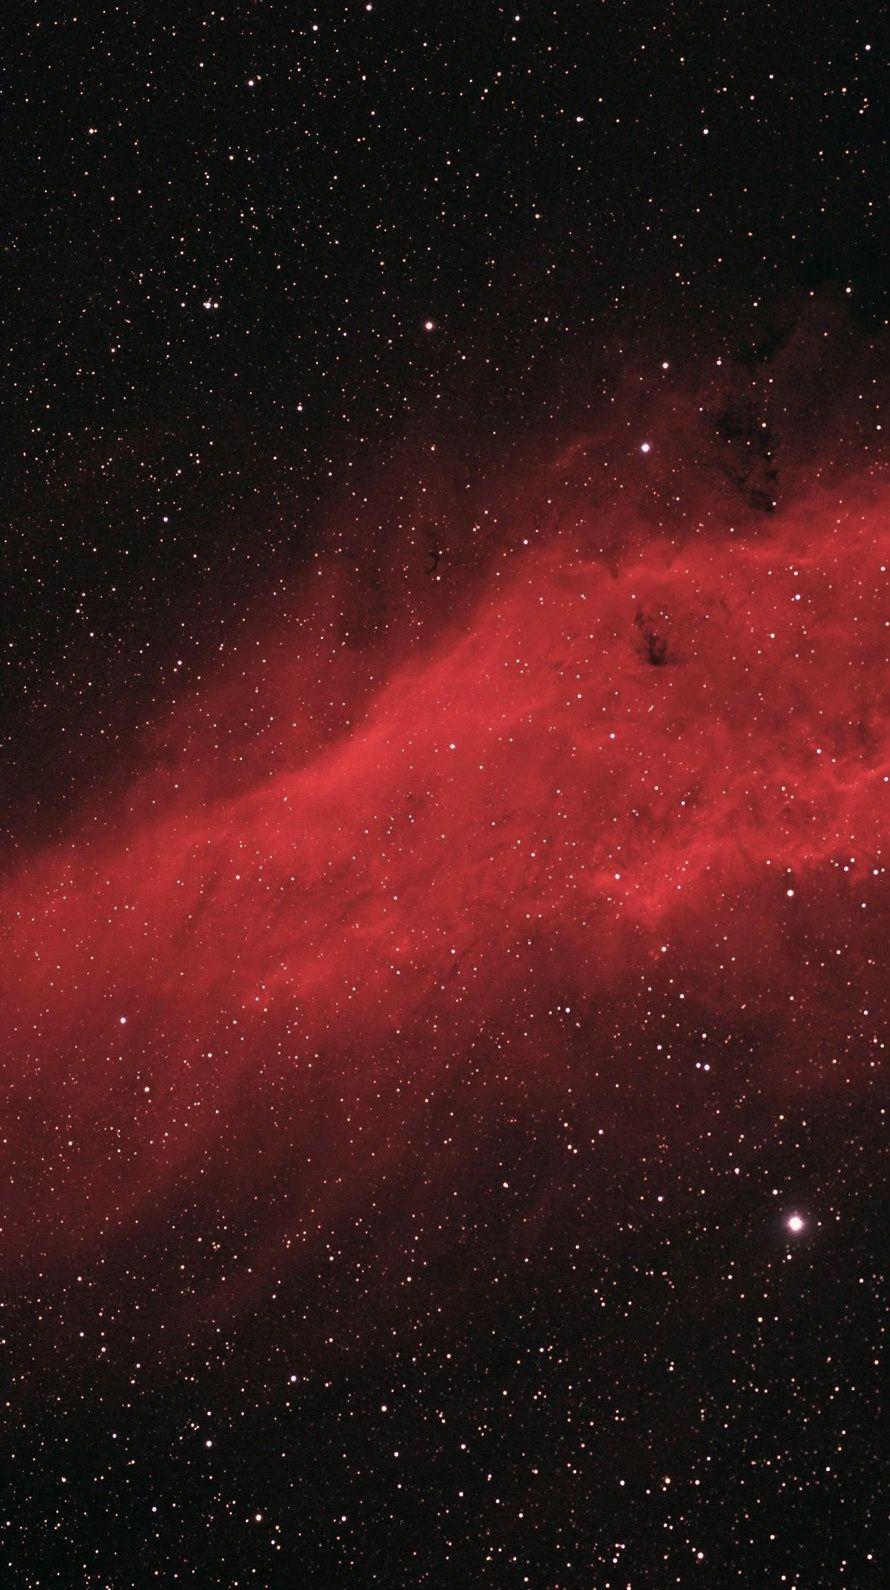 2 Sonrisa Que Ilumina Mi Alma Red And Black Wallpaper Red Wallpaper Dark Red Wallpaper Galaxy wallpaper red and black